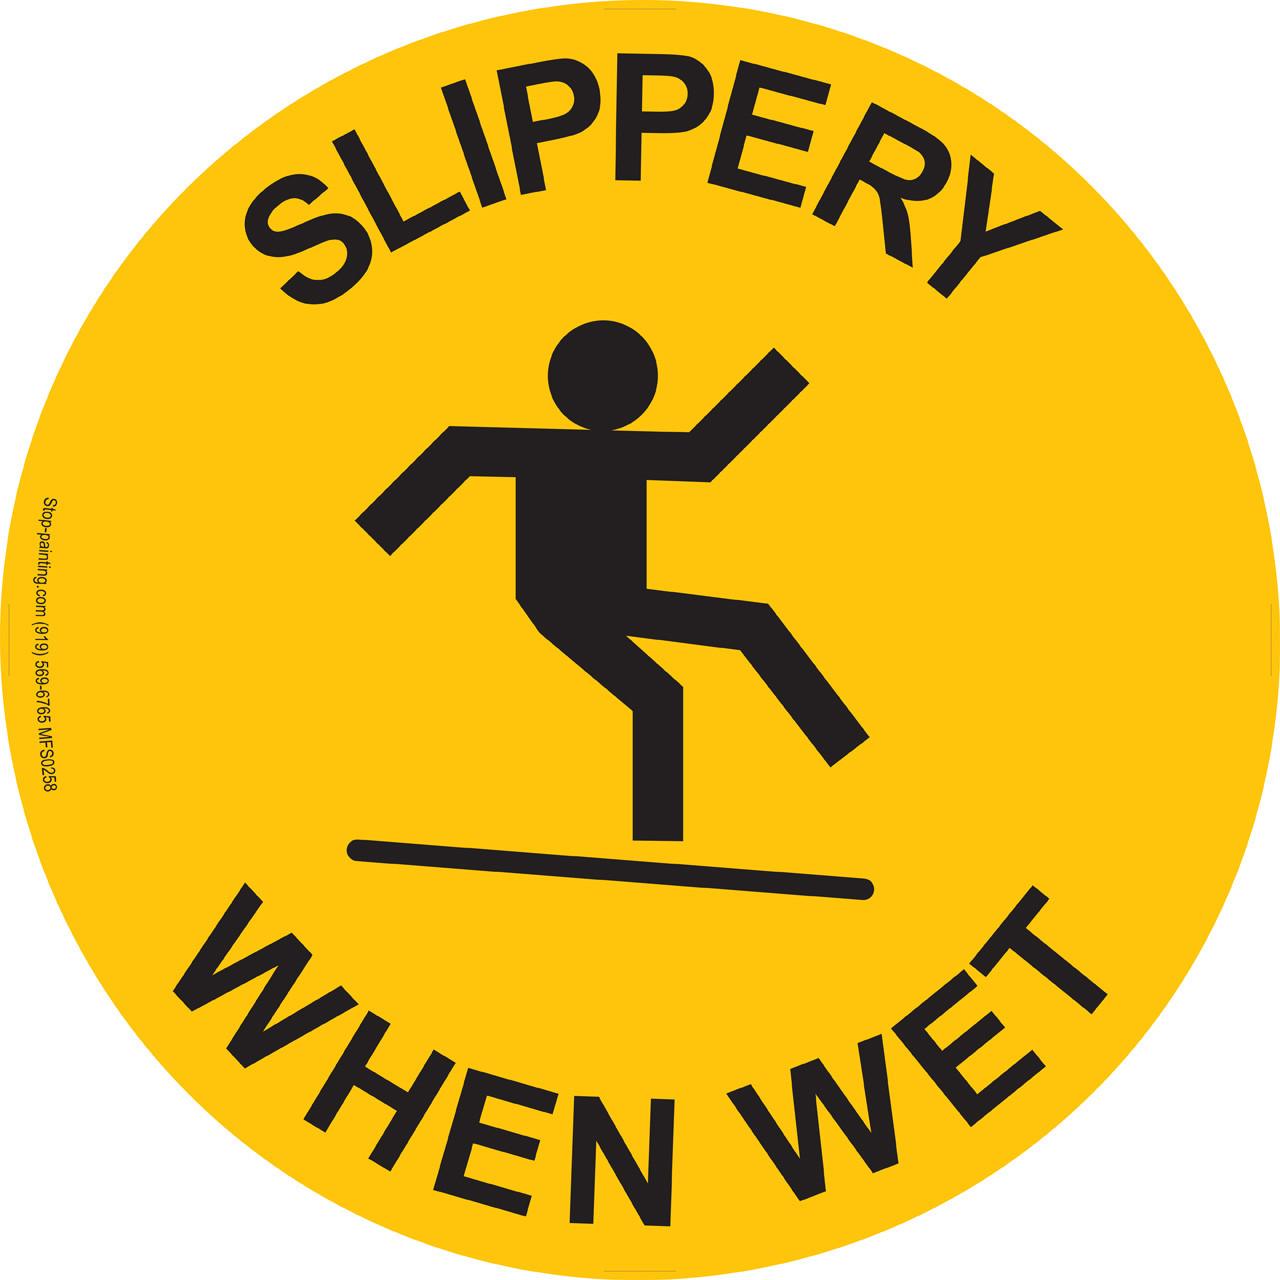 Warning Sign Slippery When Wet